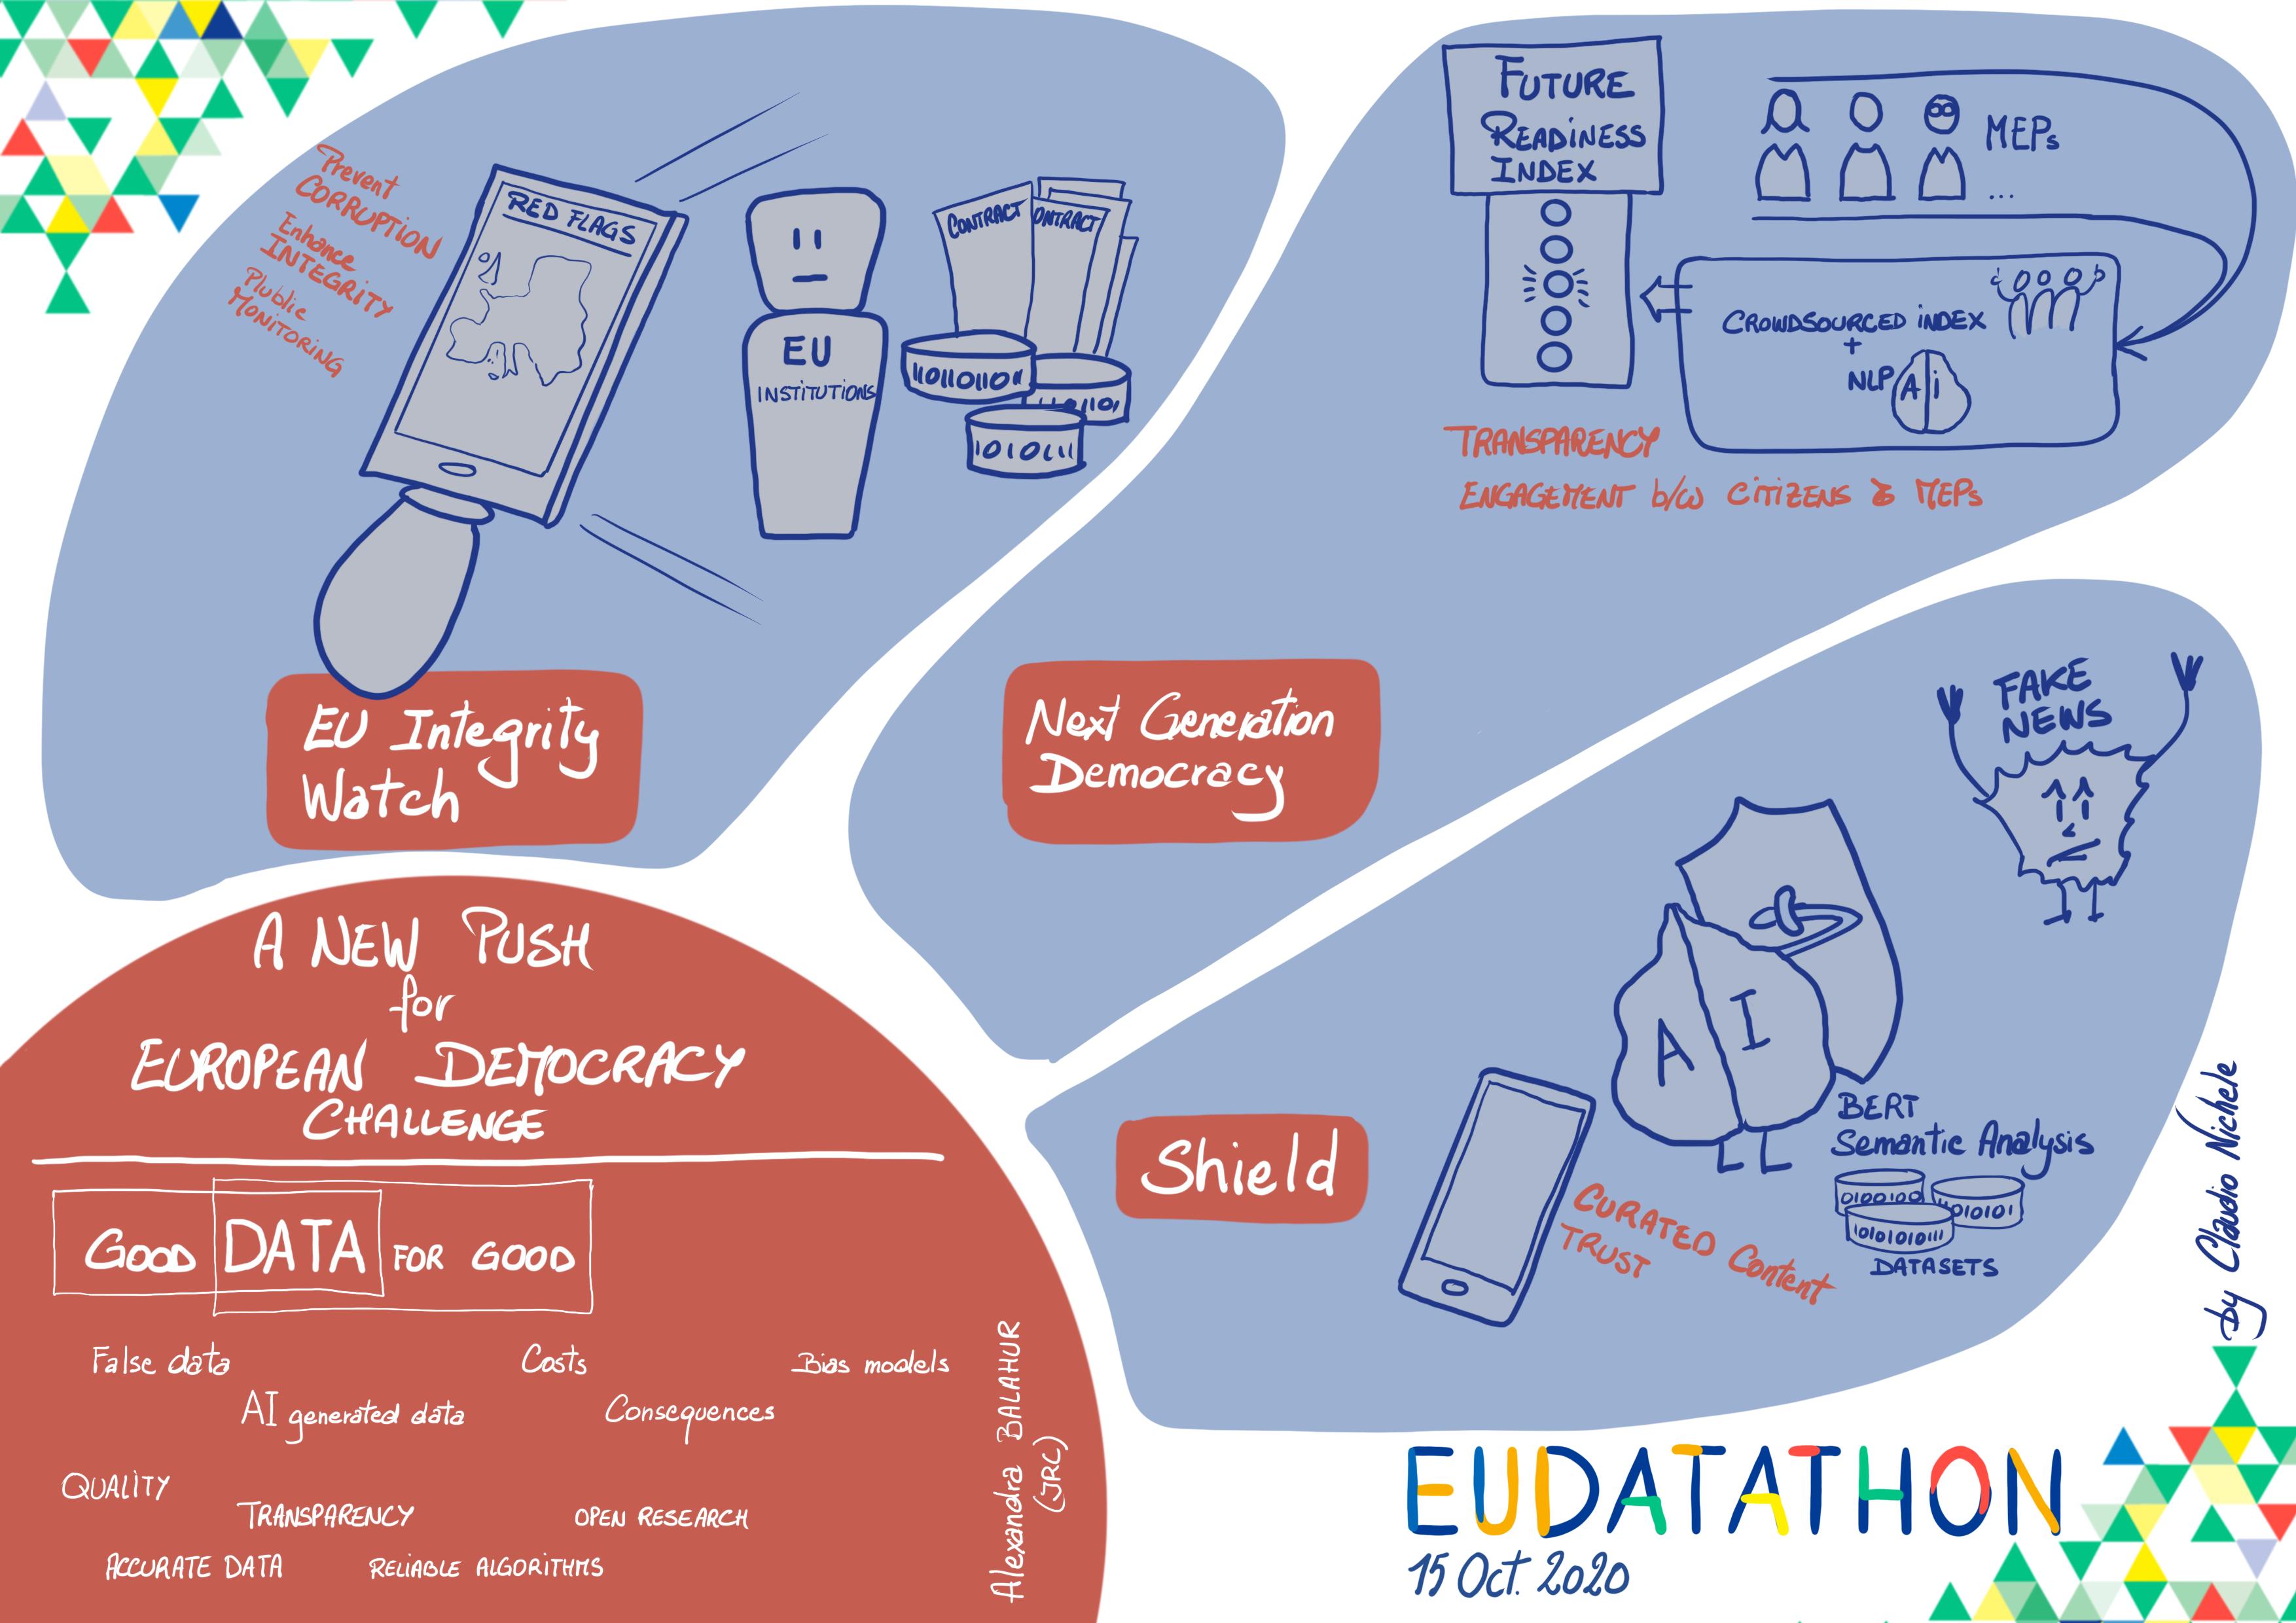 EU Datathon 2020 challenge 3